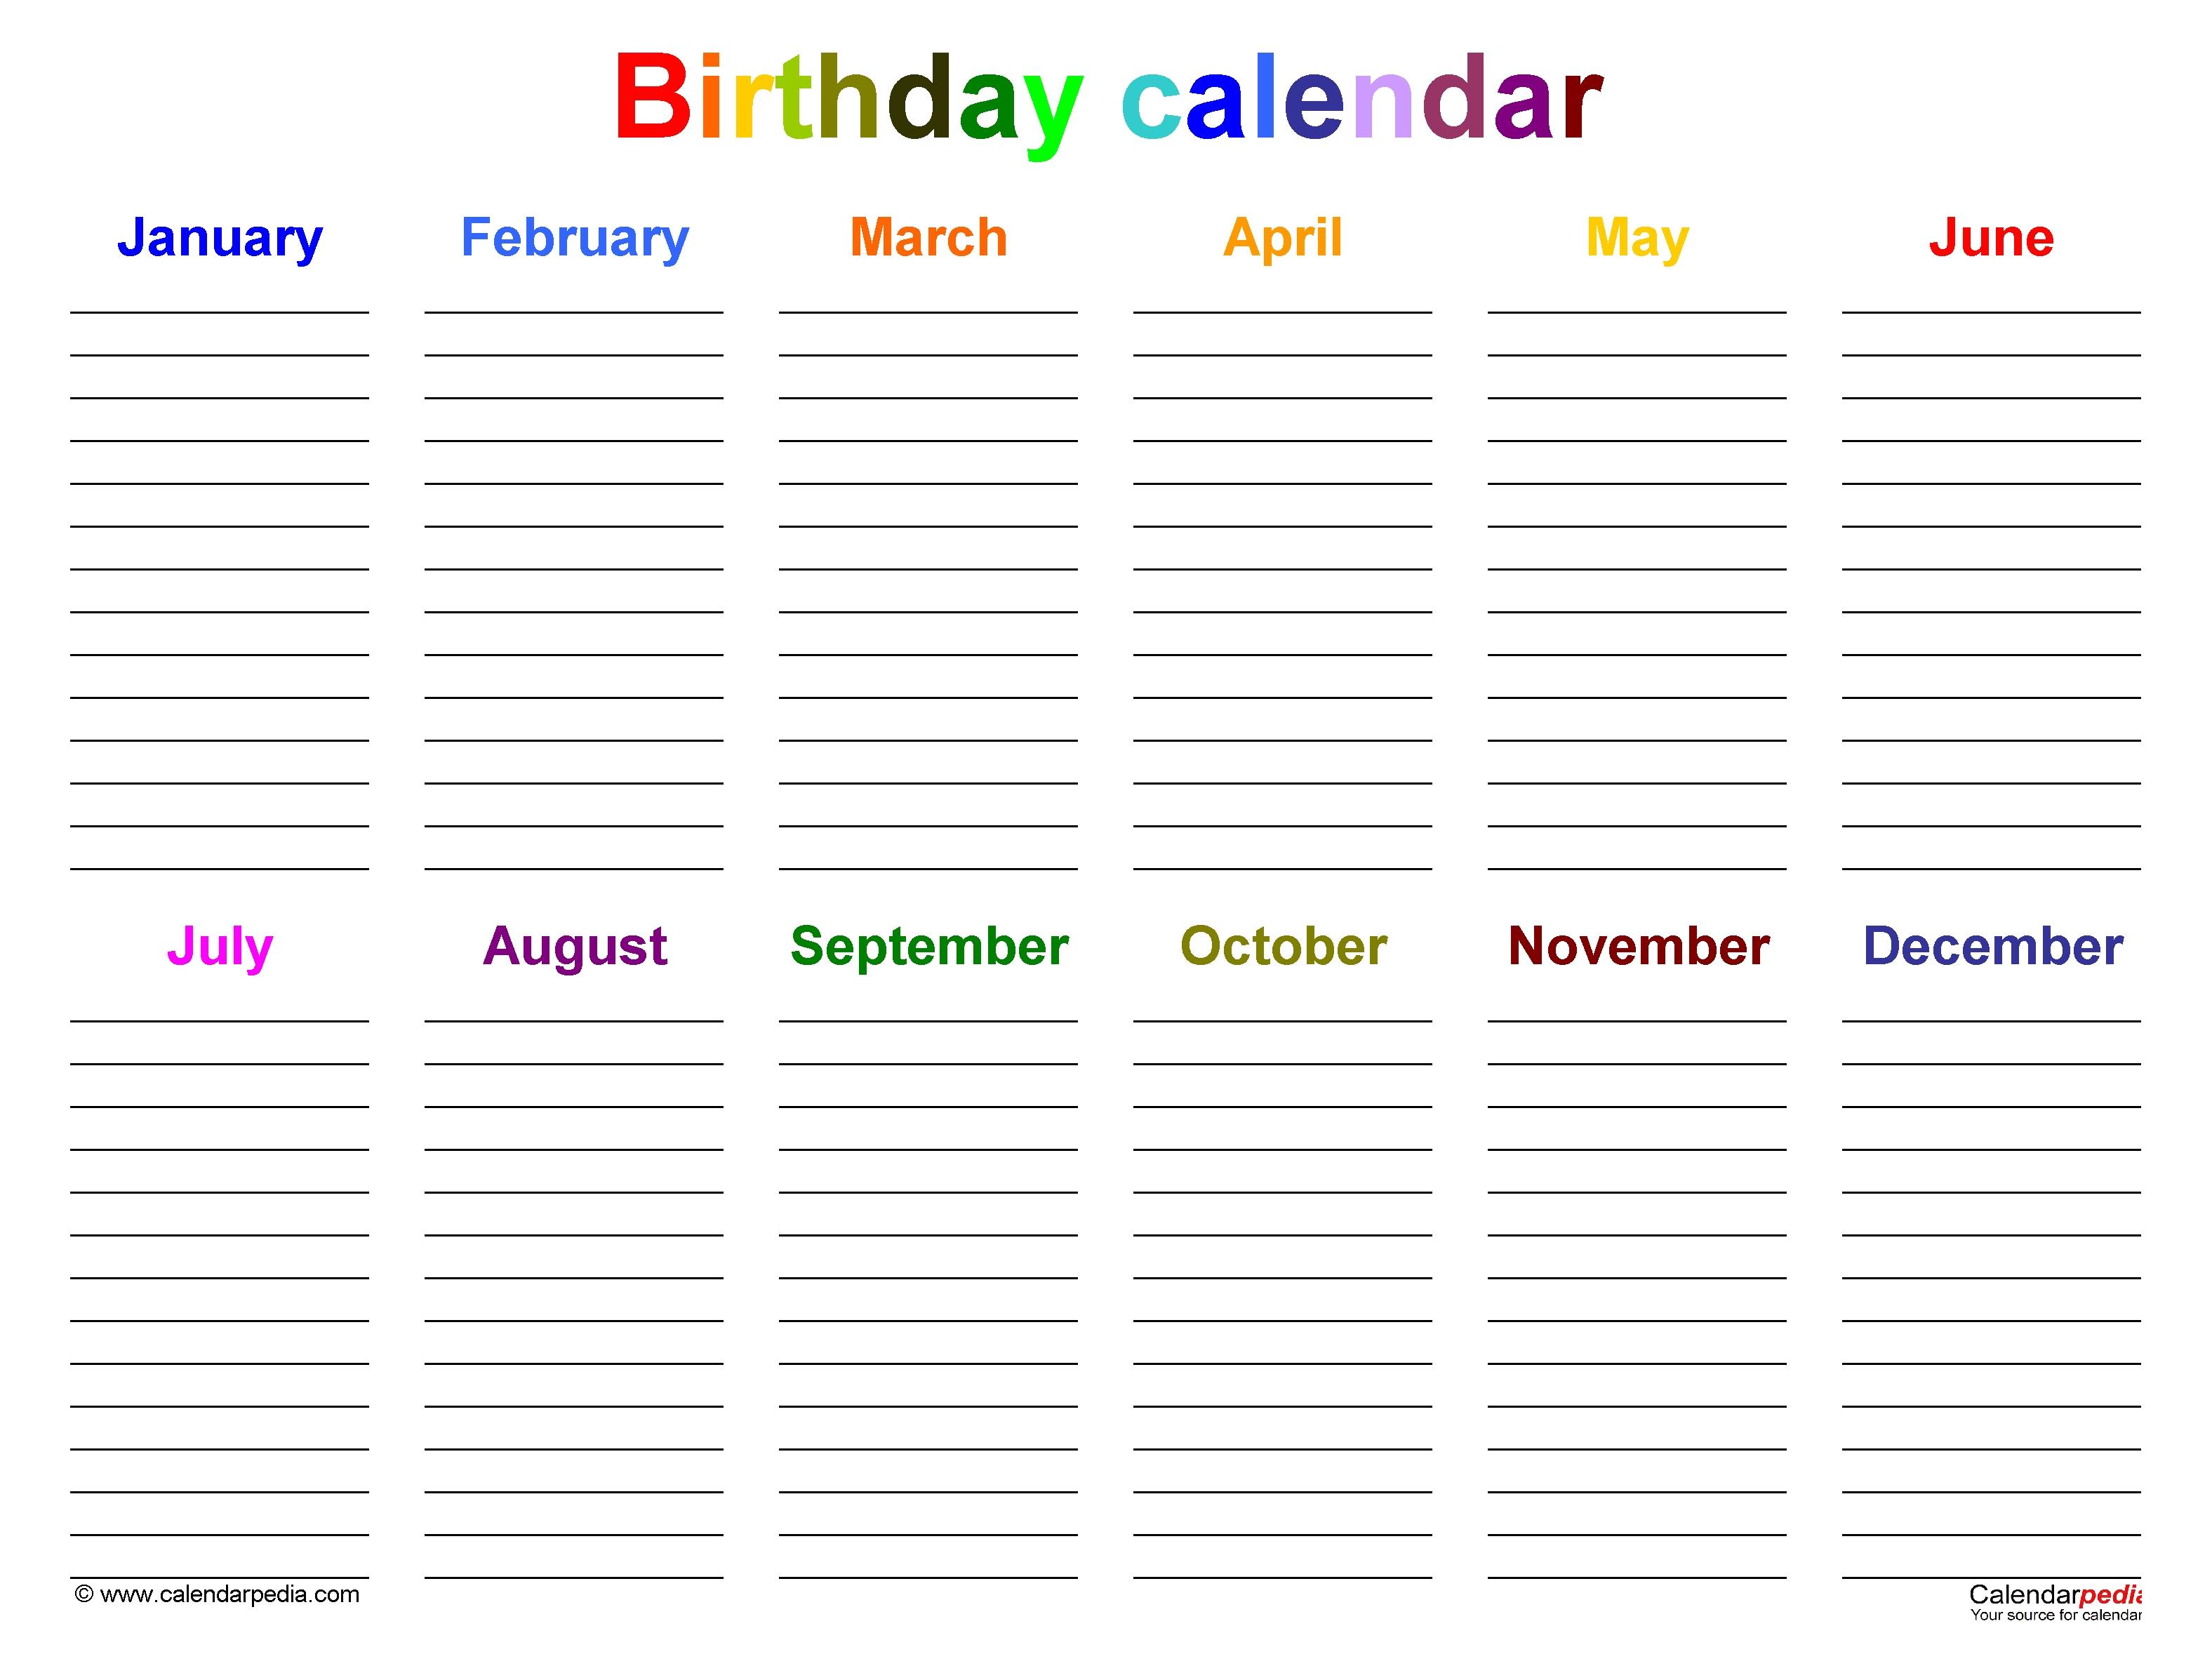 Birthday Calendars - Free Printable Microsoft Word Templates